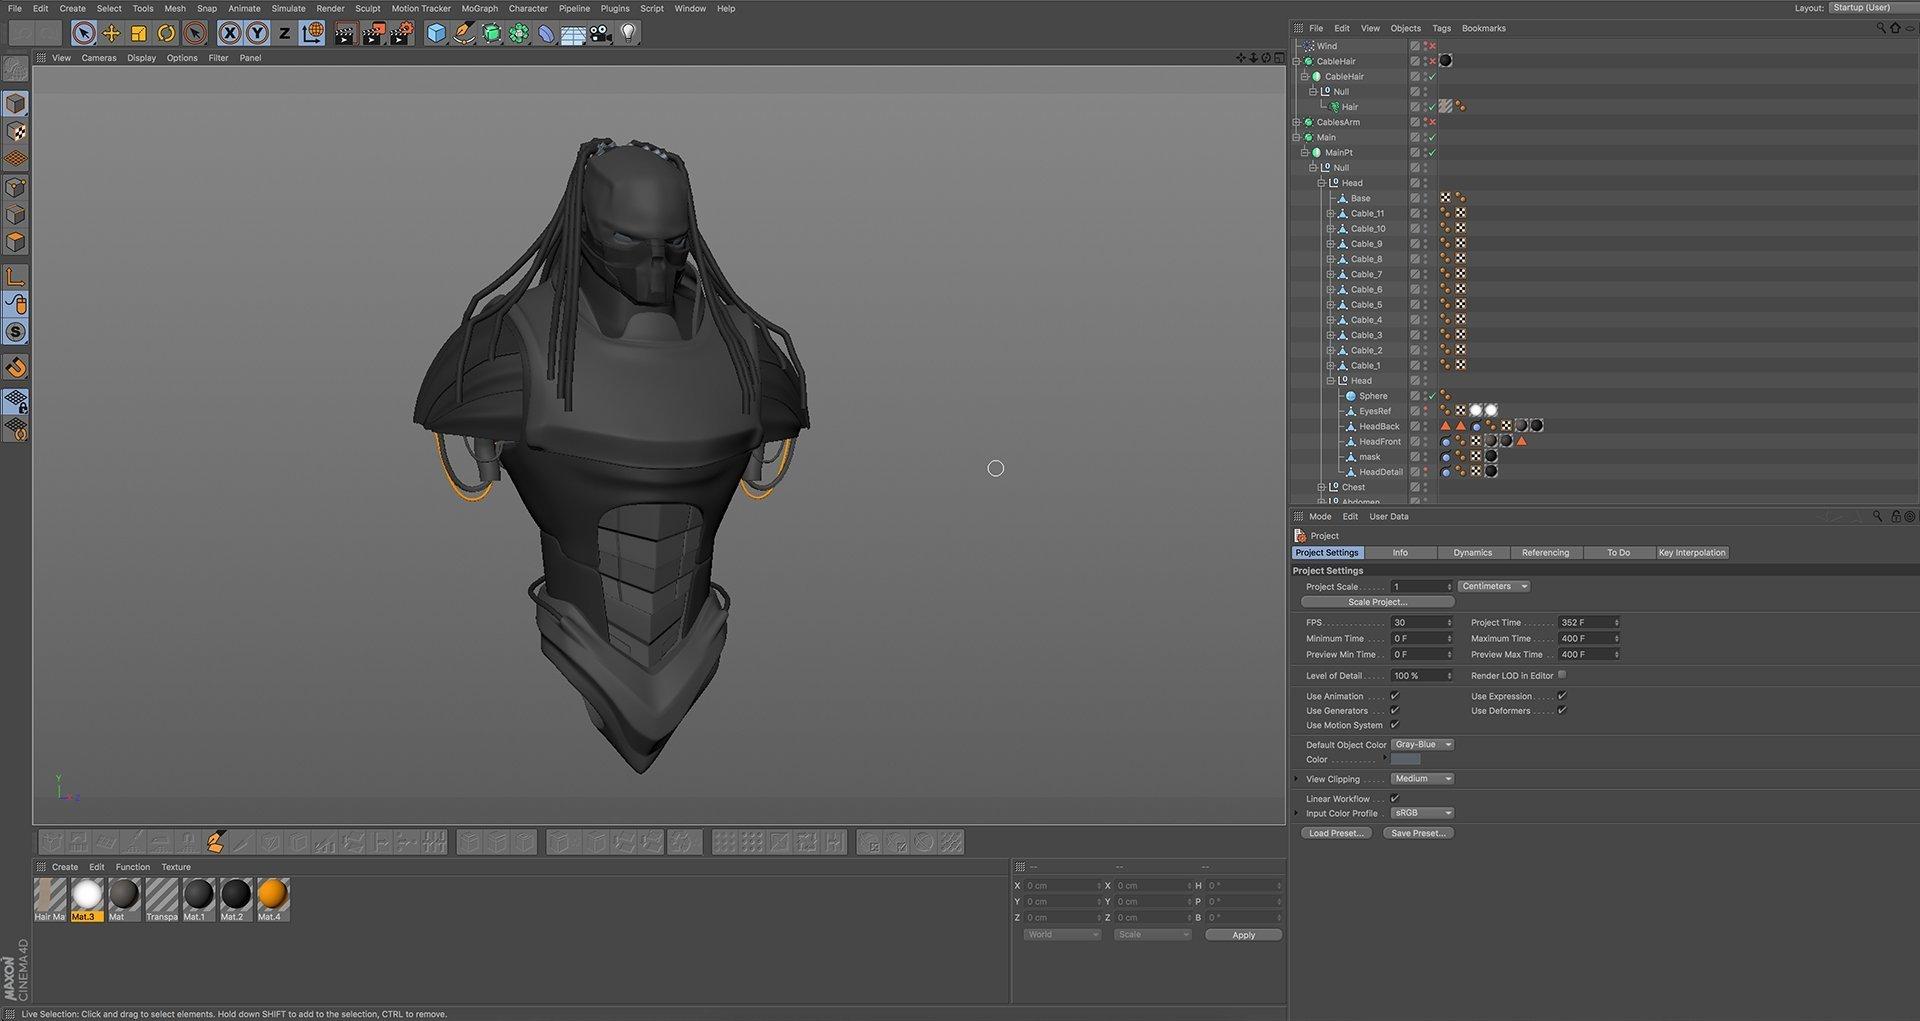 Hard Surface 3D Modeling in C4D - Elementza 3D Art Tutorials